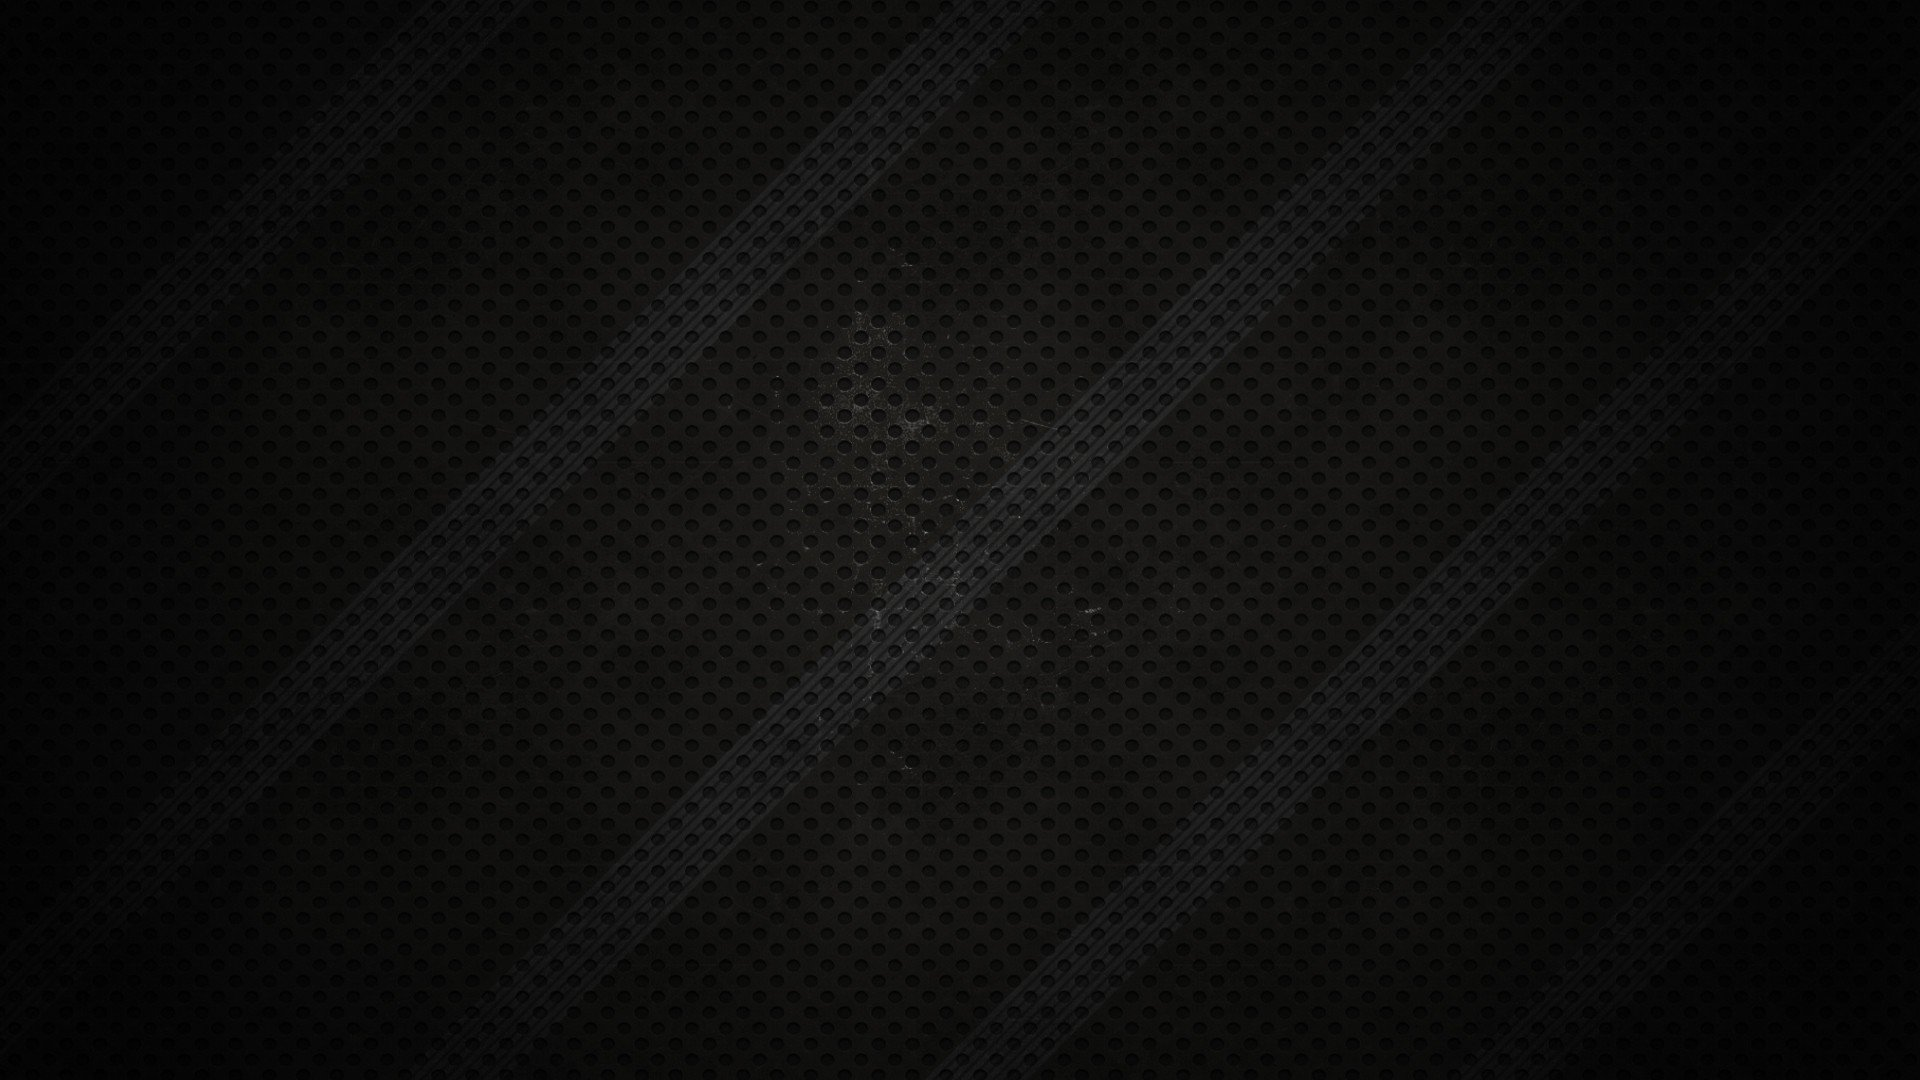 Black metal texture Polished Wallpaperup Black Metal Textures Lines Wallpaper 1920x1080 328742 Wallpaperup